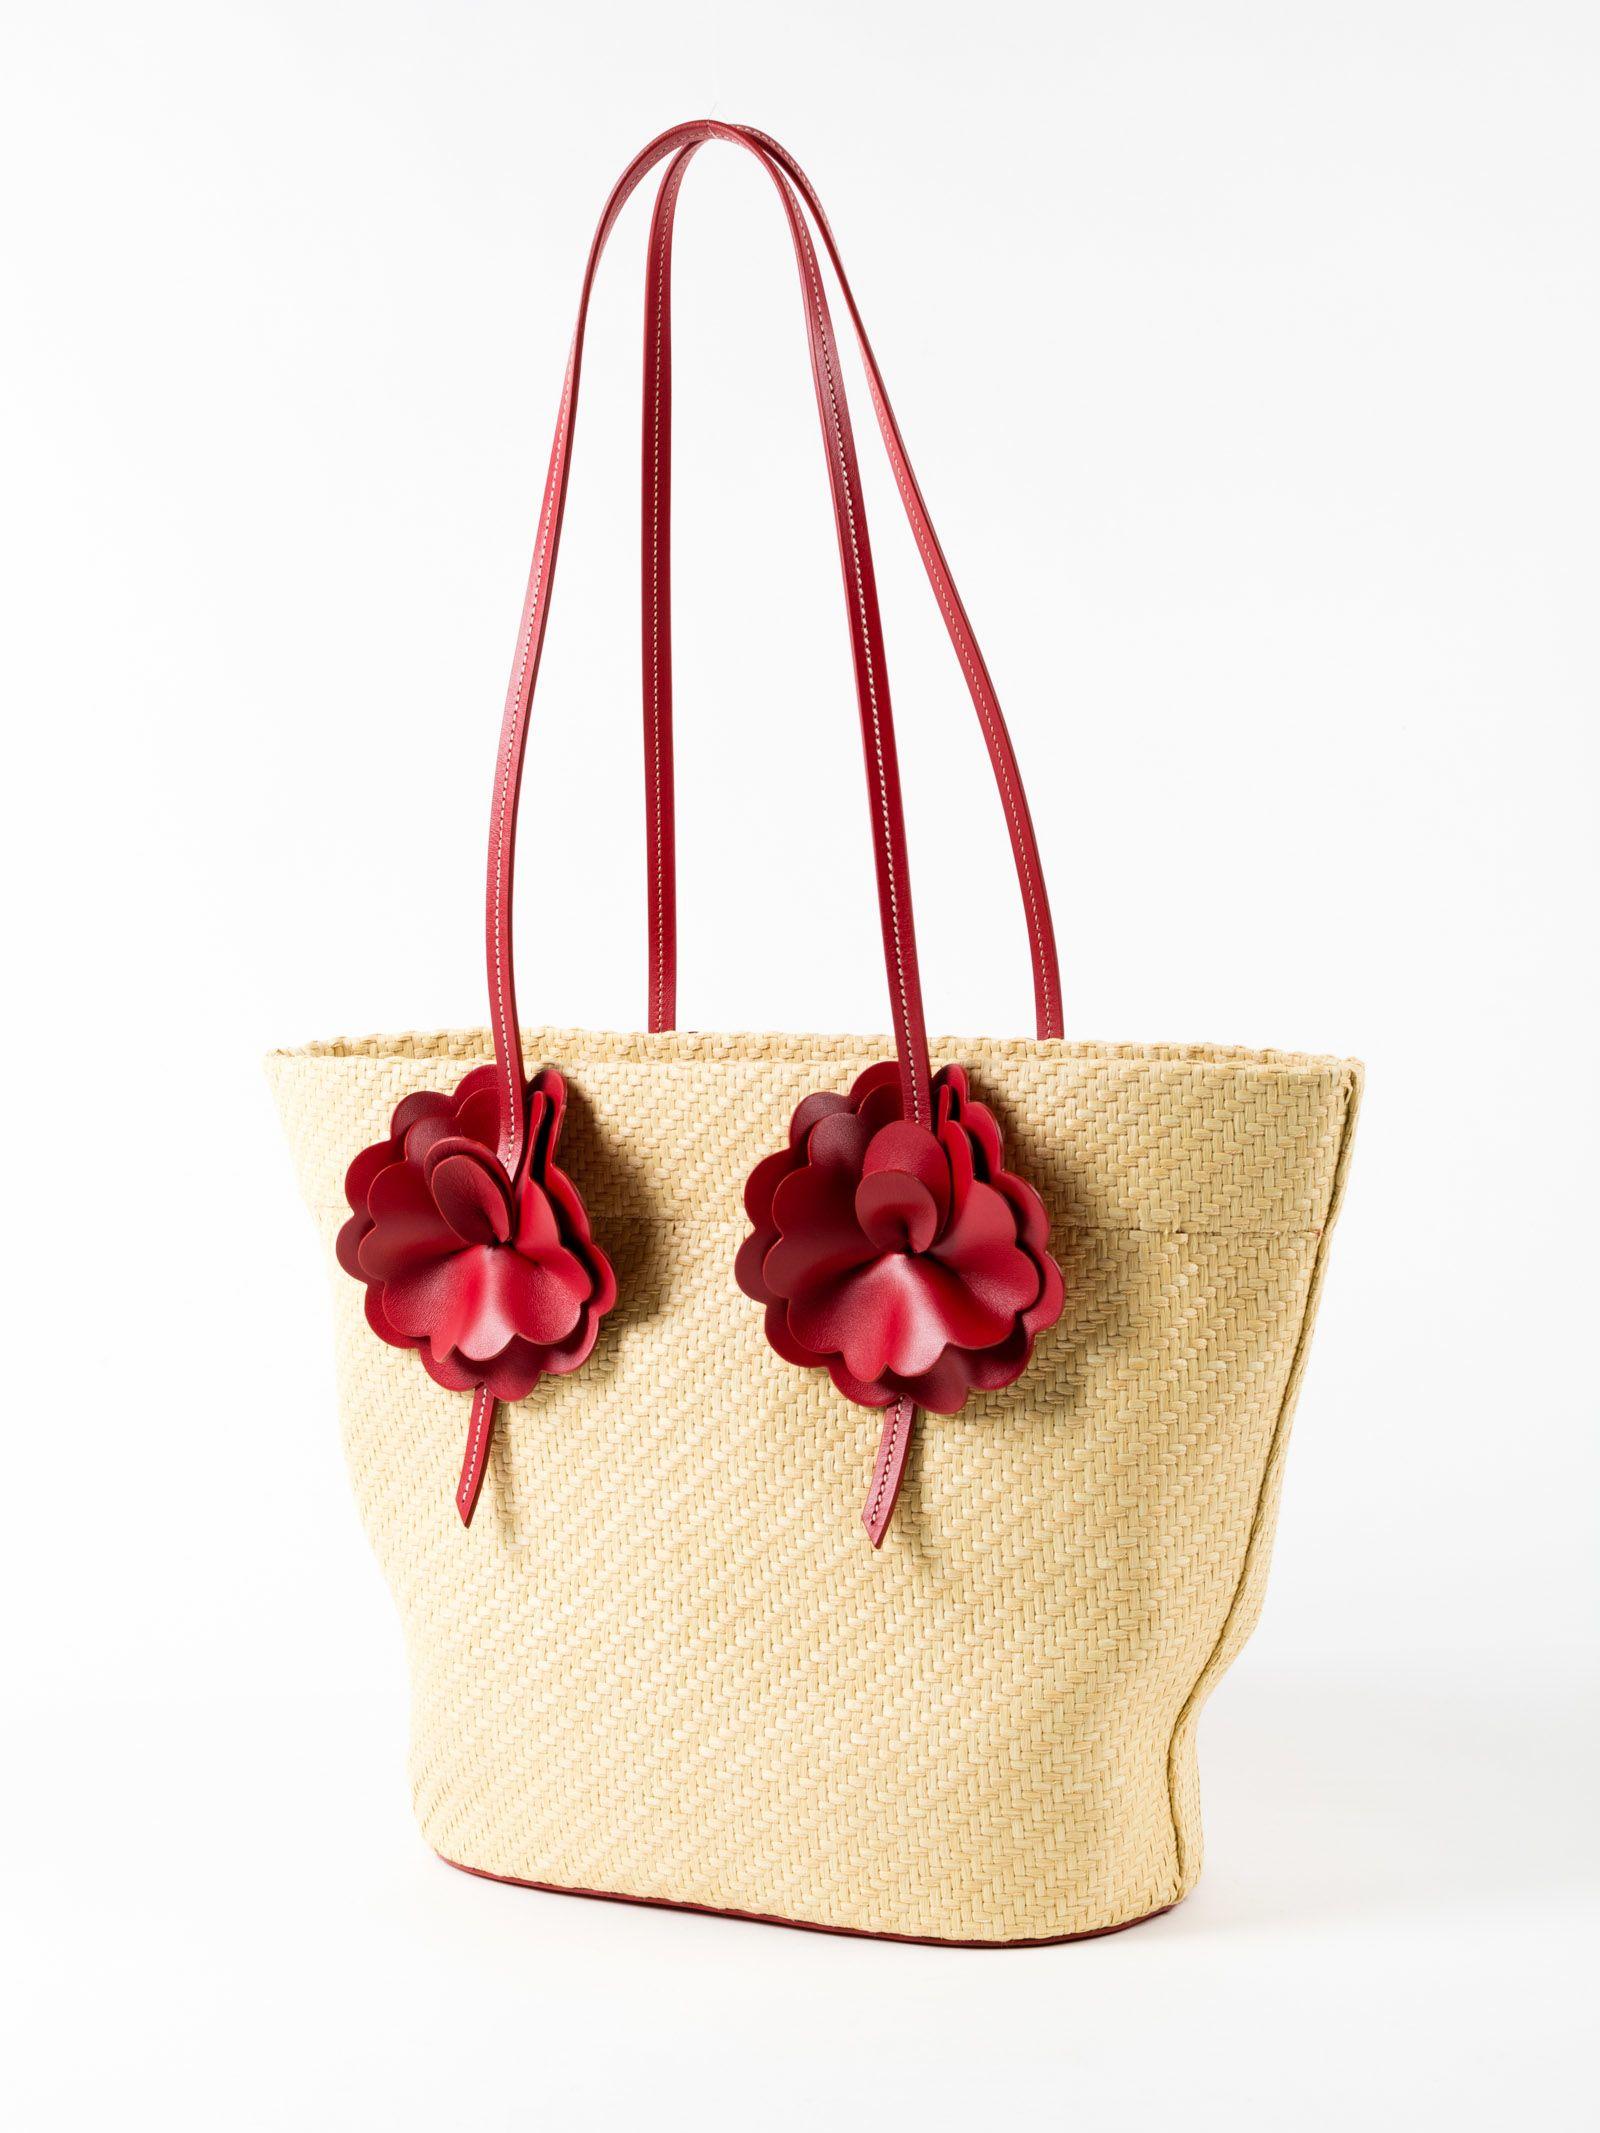 Miu Miu Shoulder Bag for Women On Sale, Straw, Straw, 2017, one size